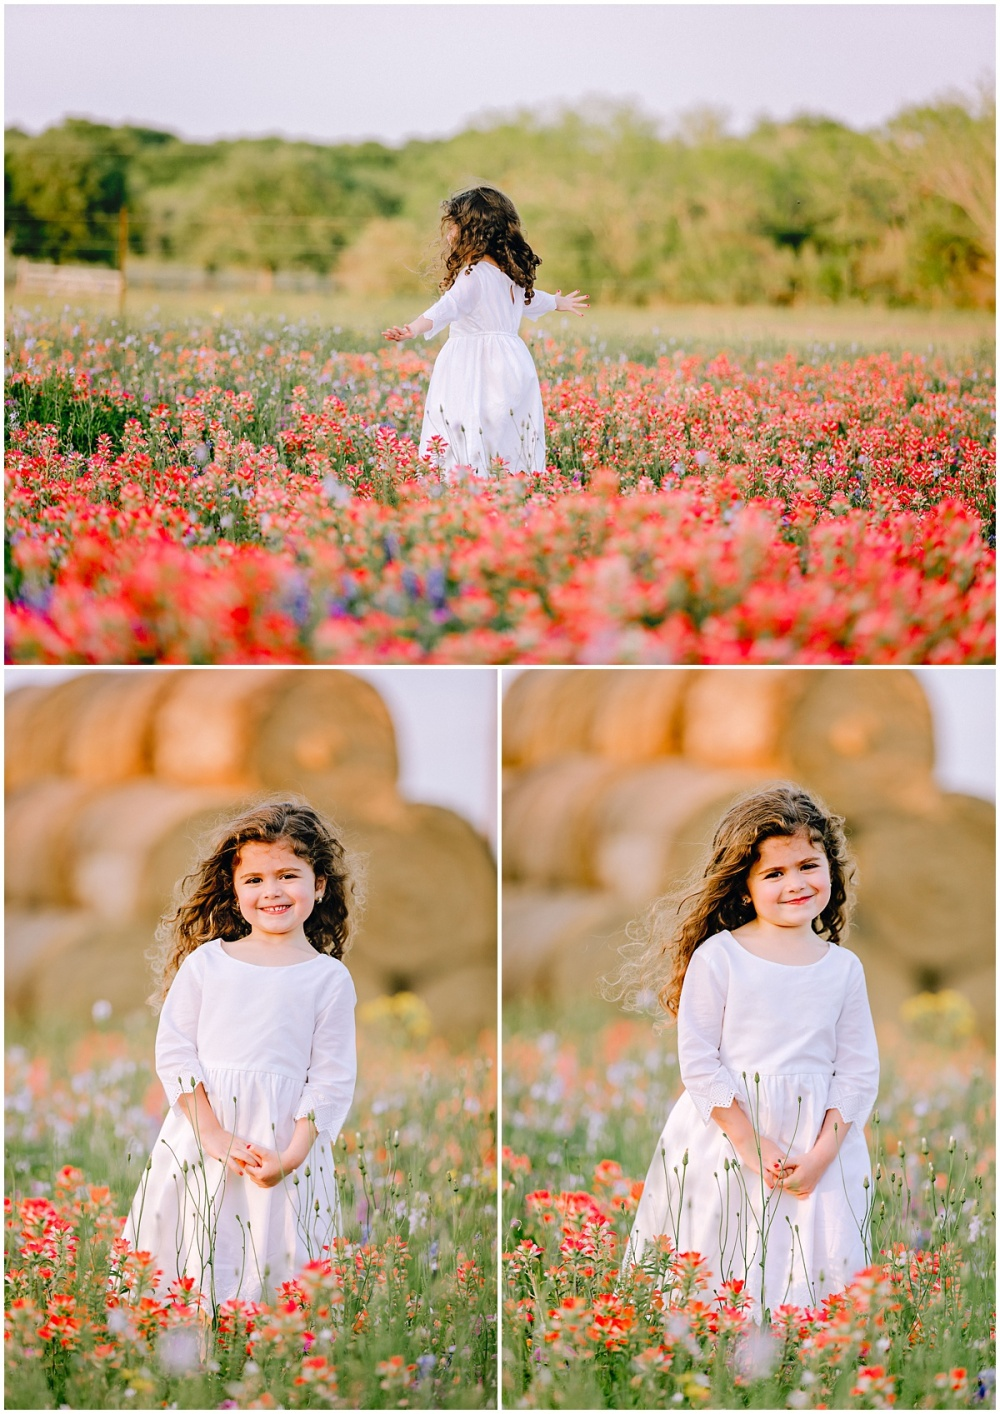 Wildflowers-Texas-Bluebonnets-Spring-Birthday-Photo-Session-Kids-Carly-Barton-Photography_0002.jpg